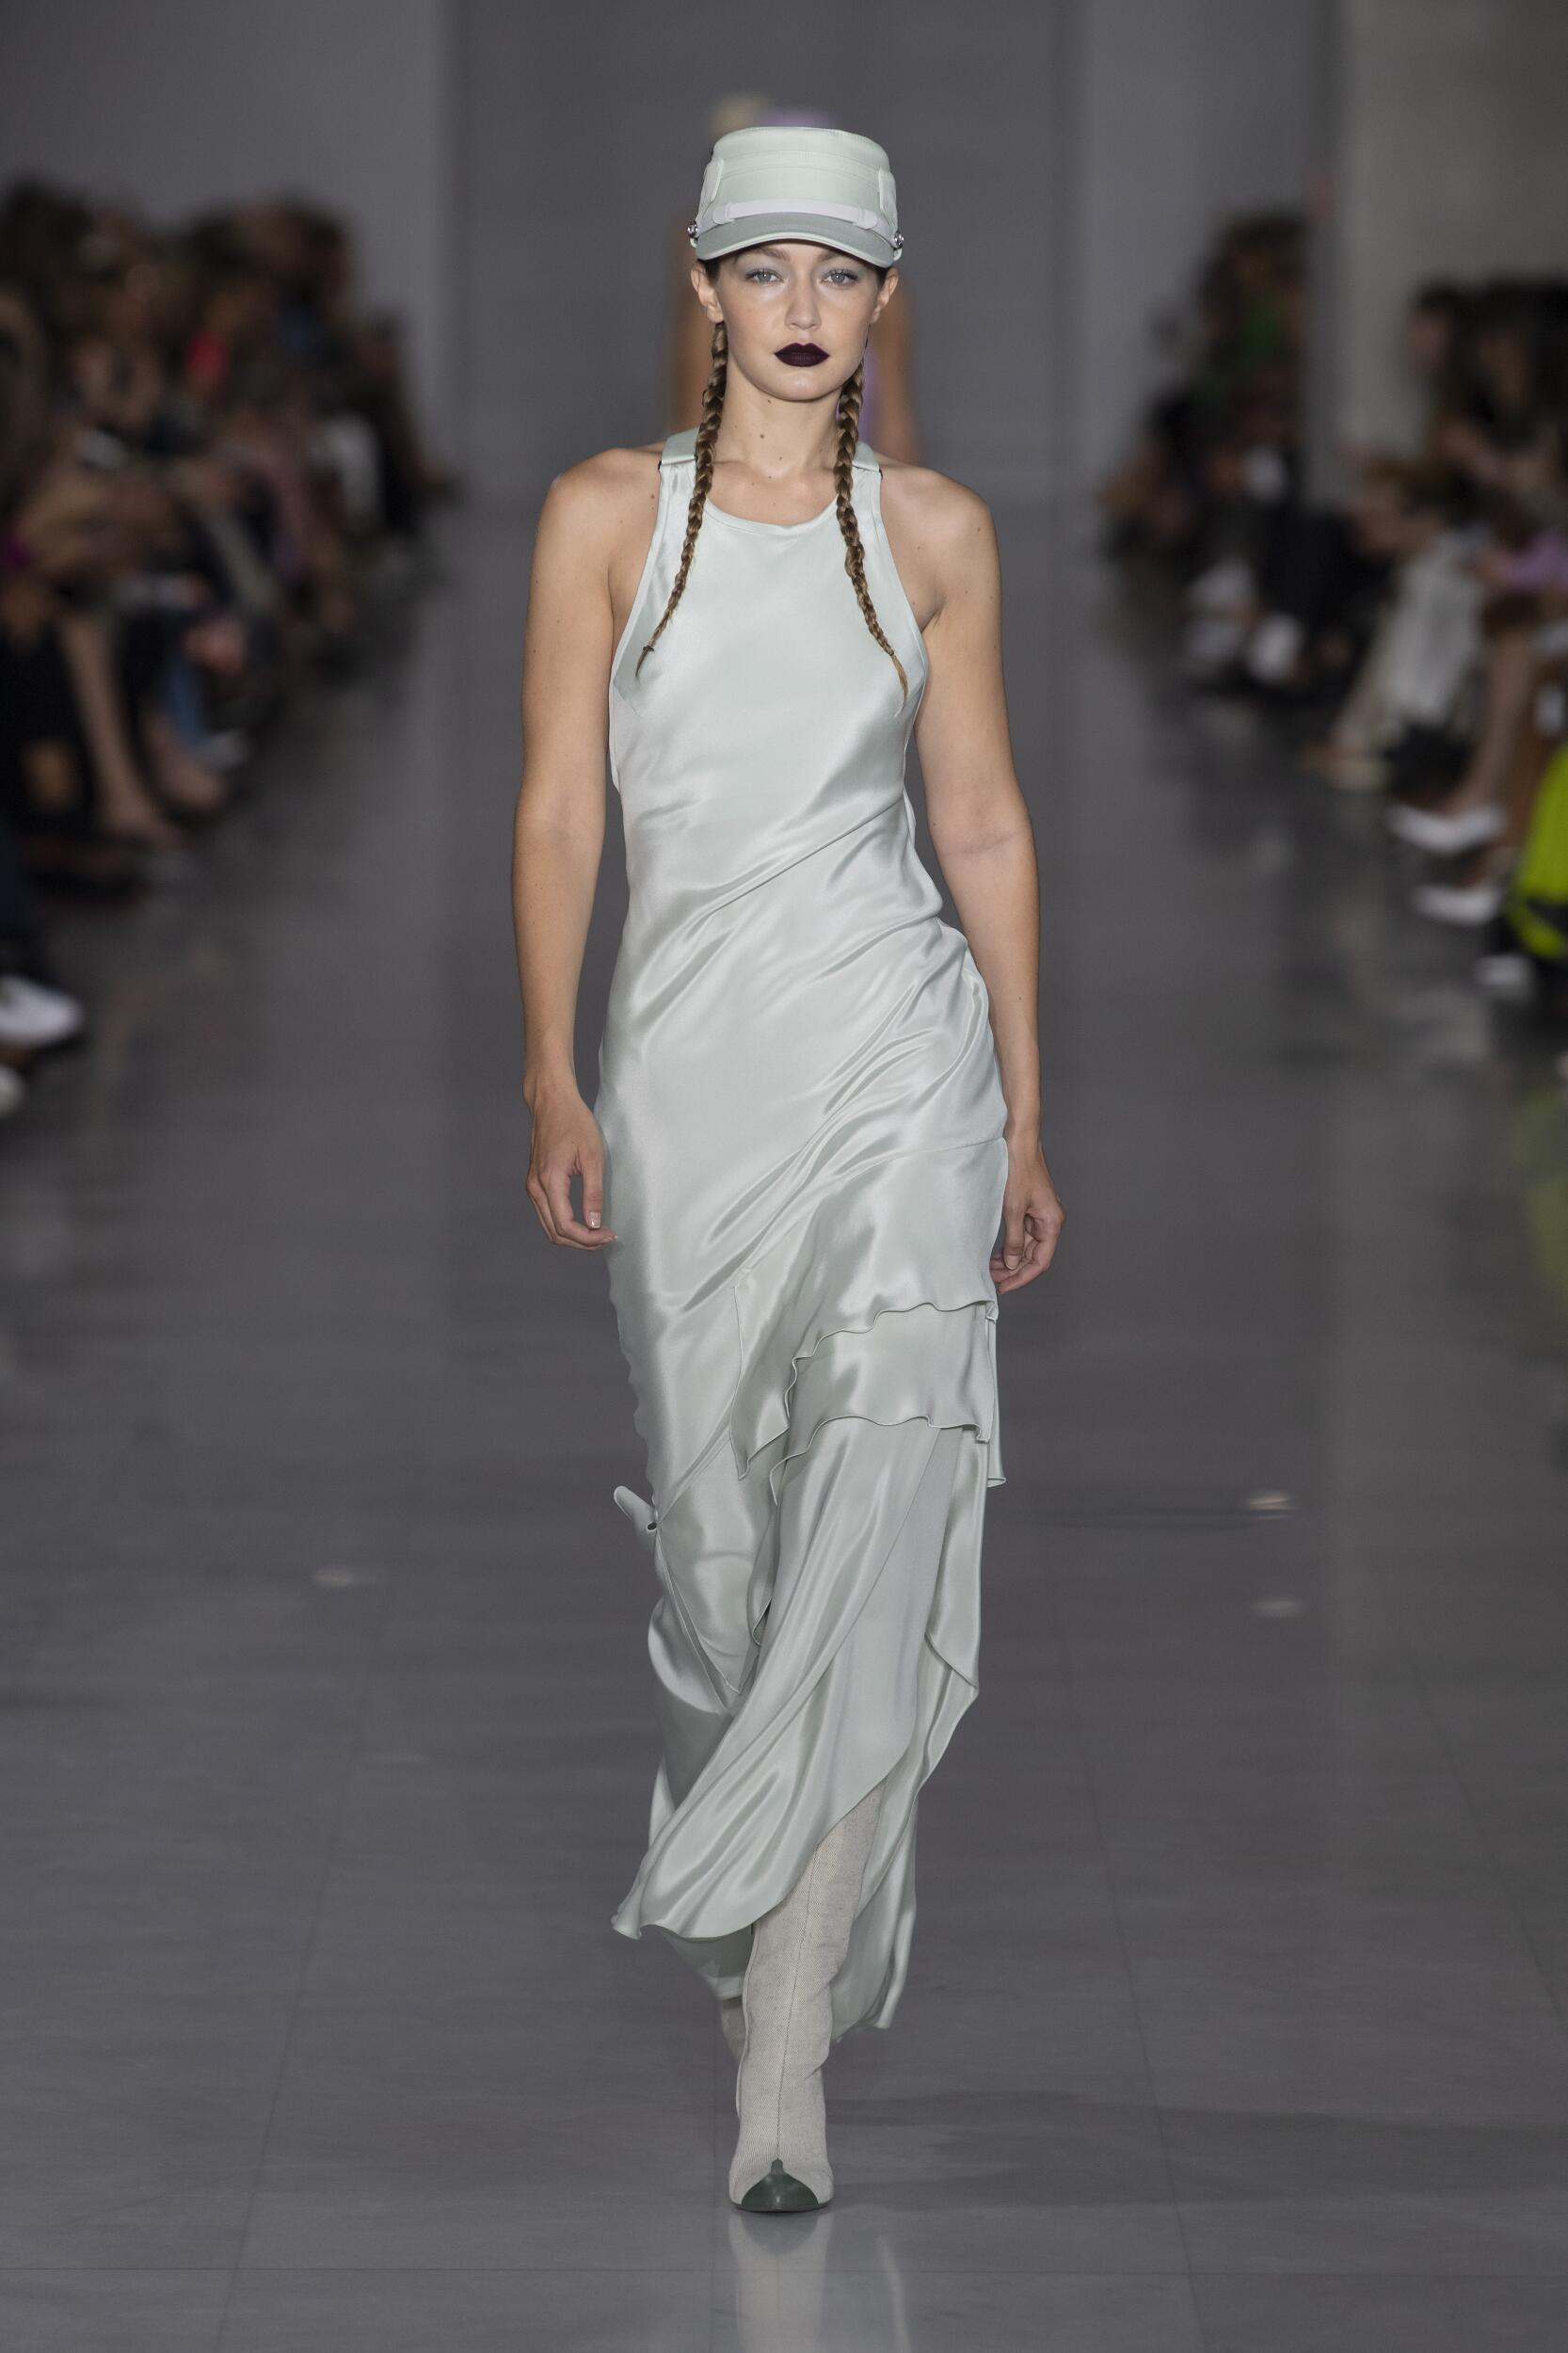 Spring Summer Fashion Trends 2020 Max Mara